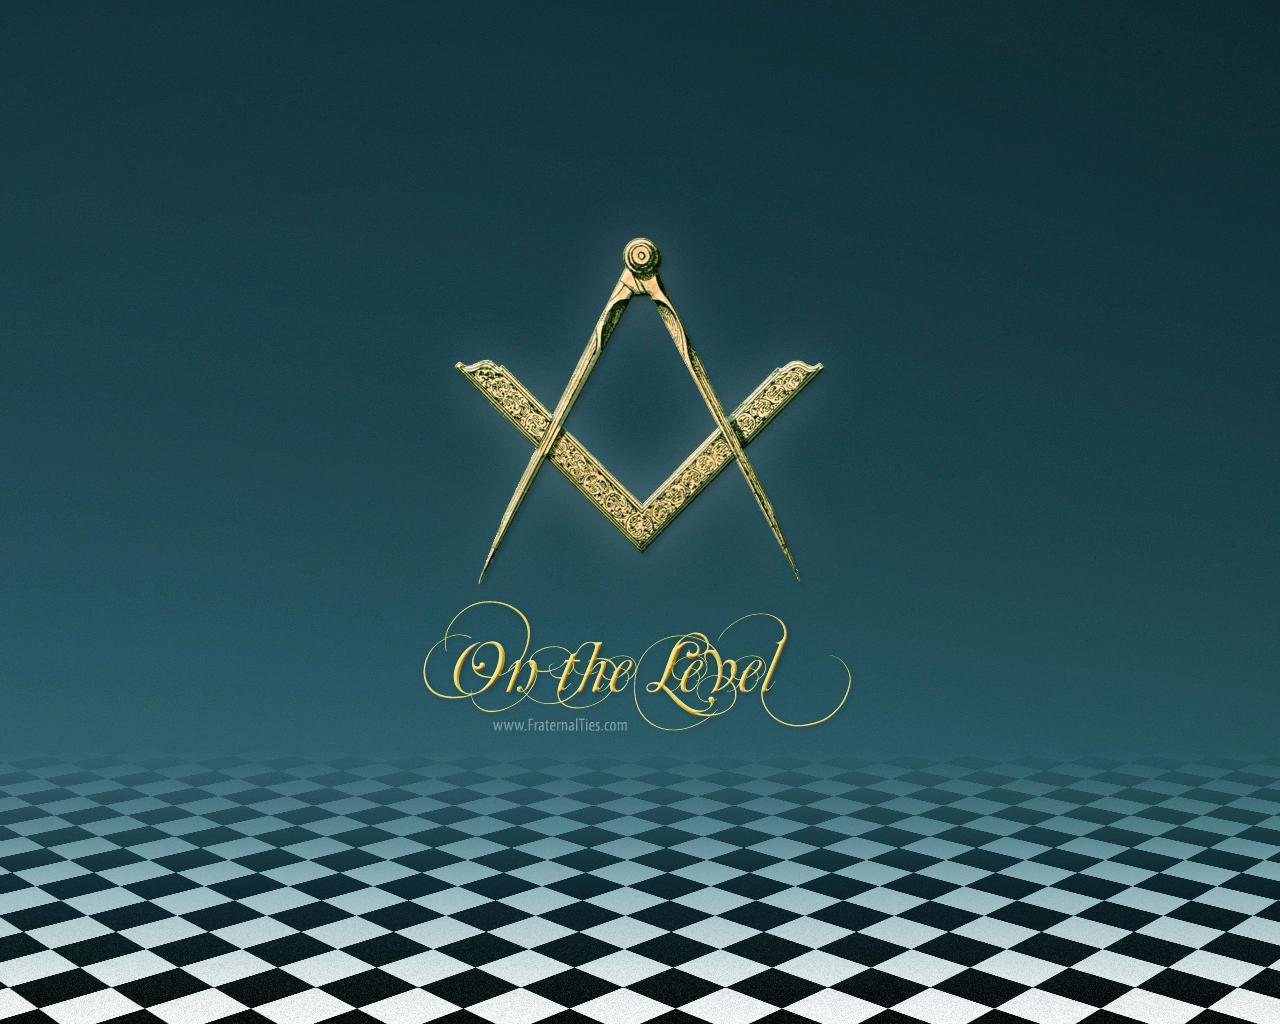 Freemason Wallpapers 1280x1024